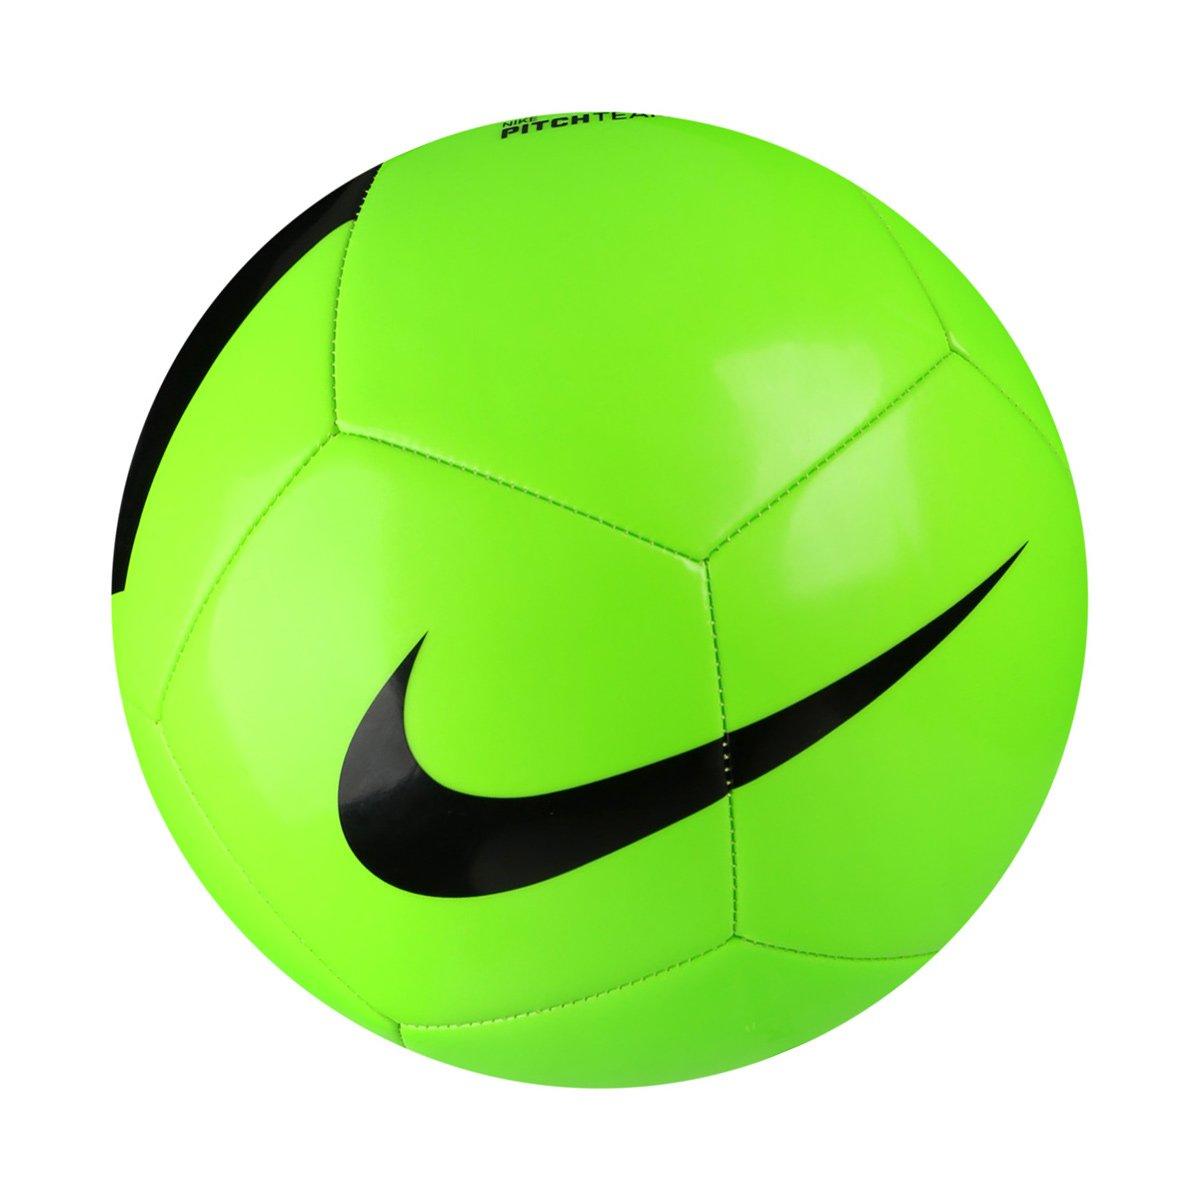 Bola Futebol Campo Nike Pich Team - Verde Claro e Preto - Compre ... 2a705ab4d7a42